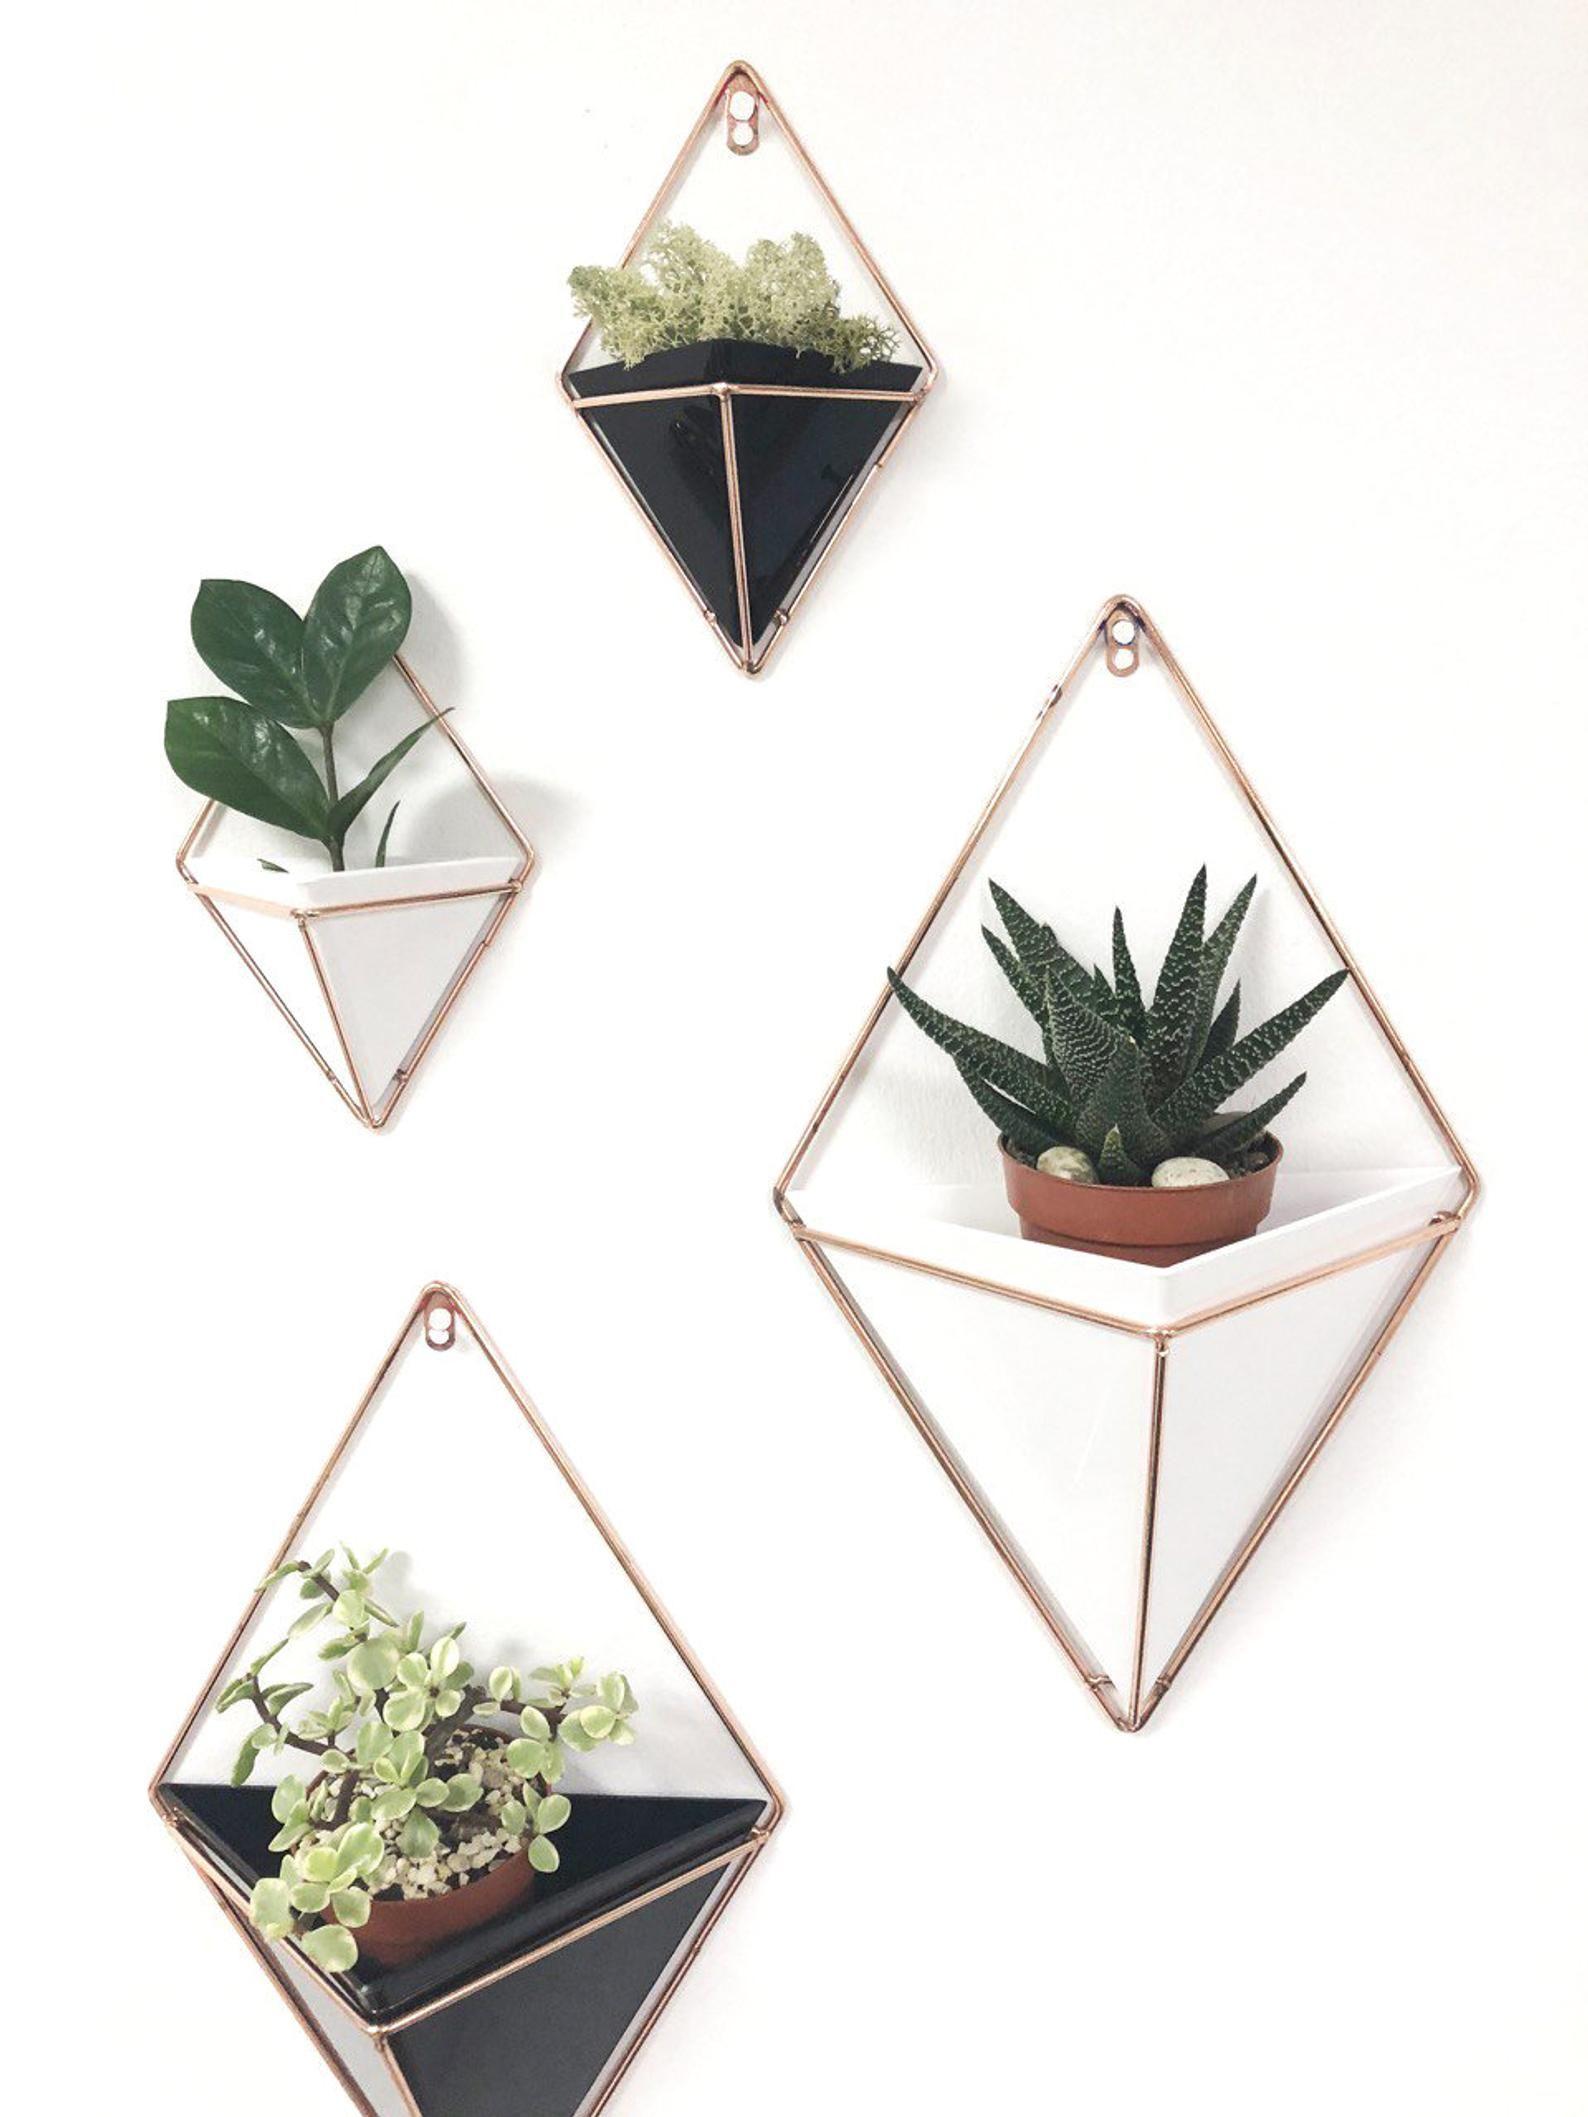 Geometric Wall Planter, Geometric Planter, Hanging Planter